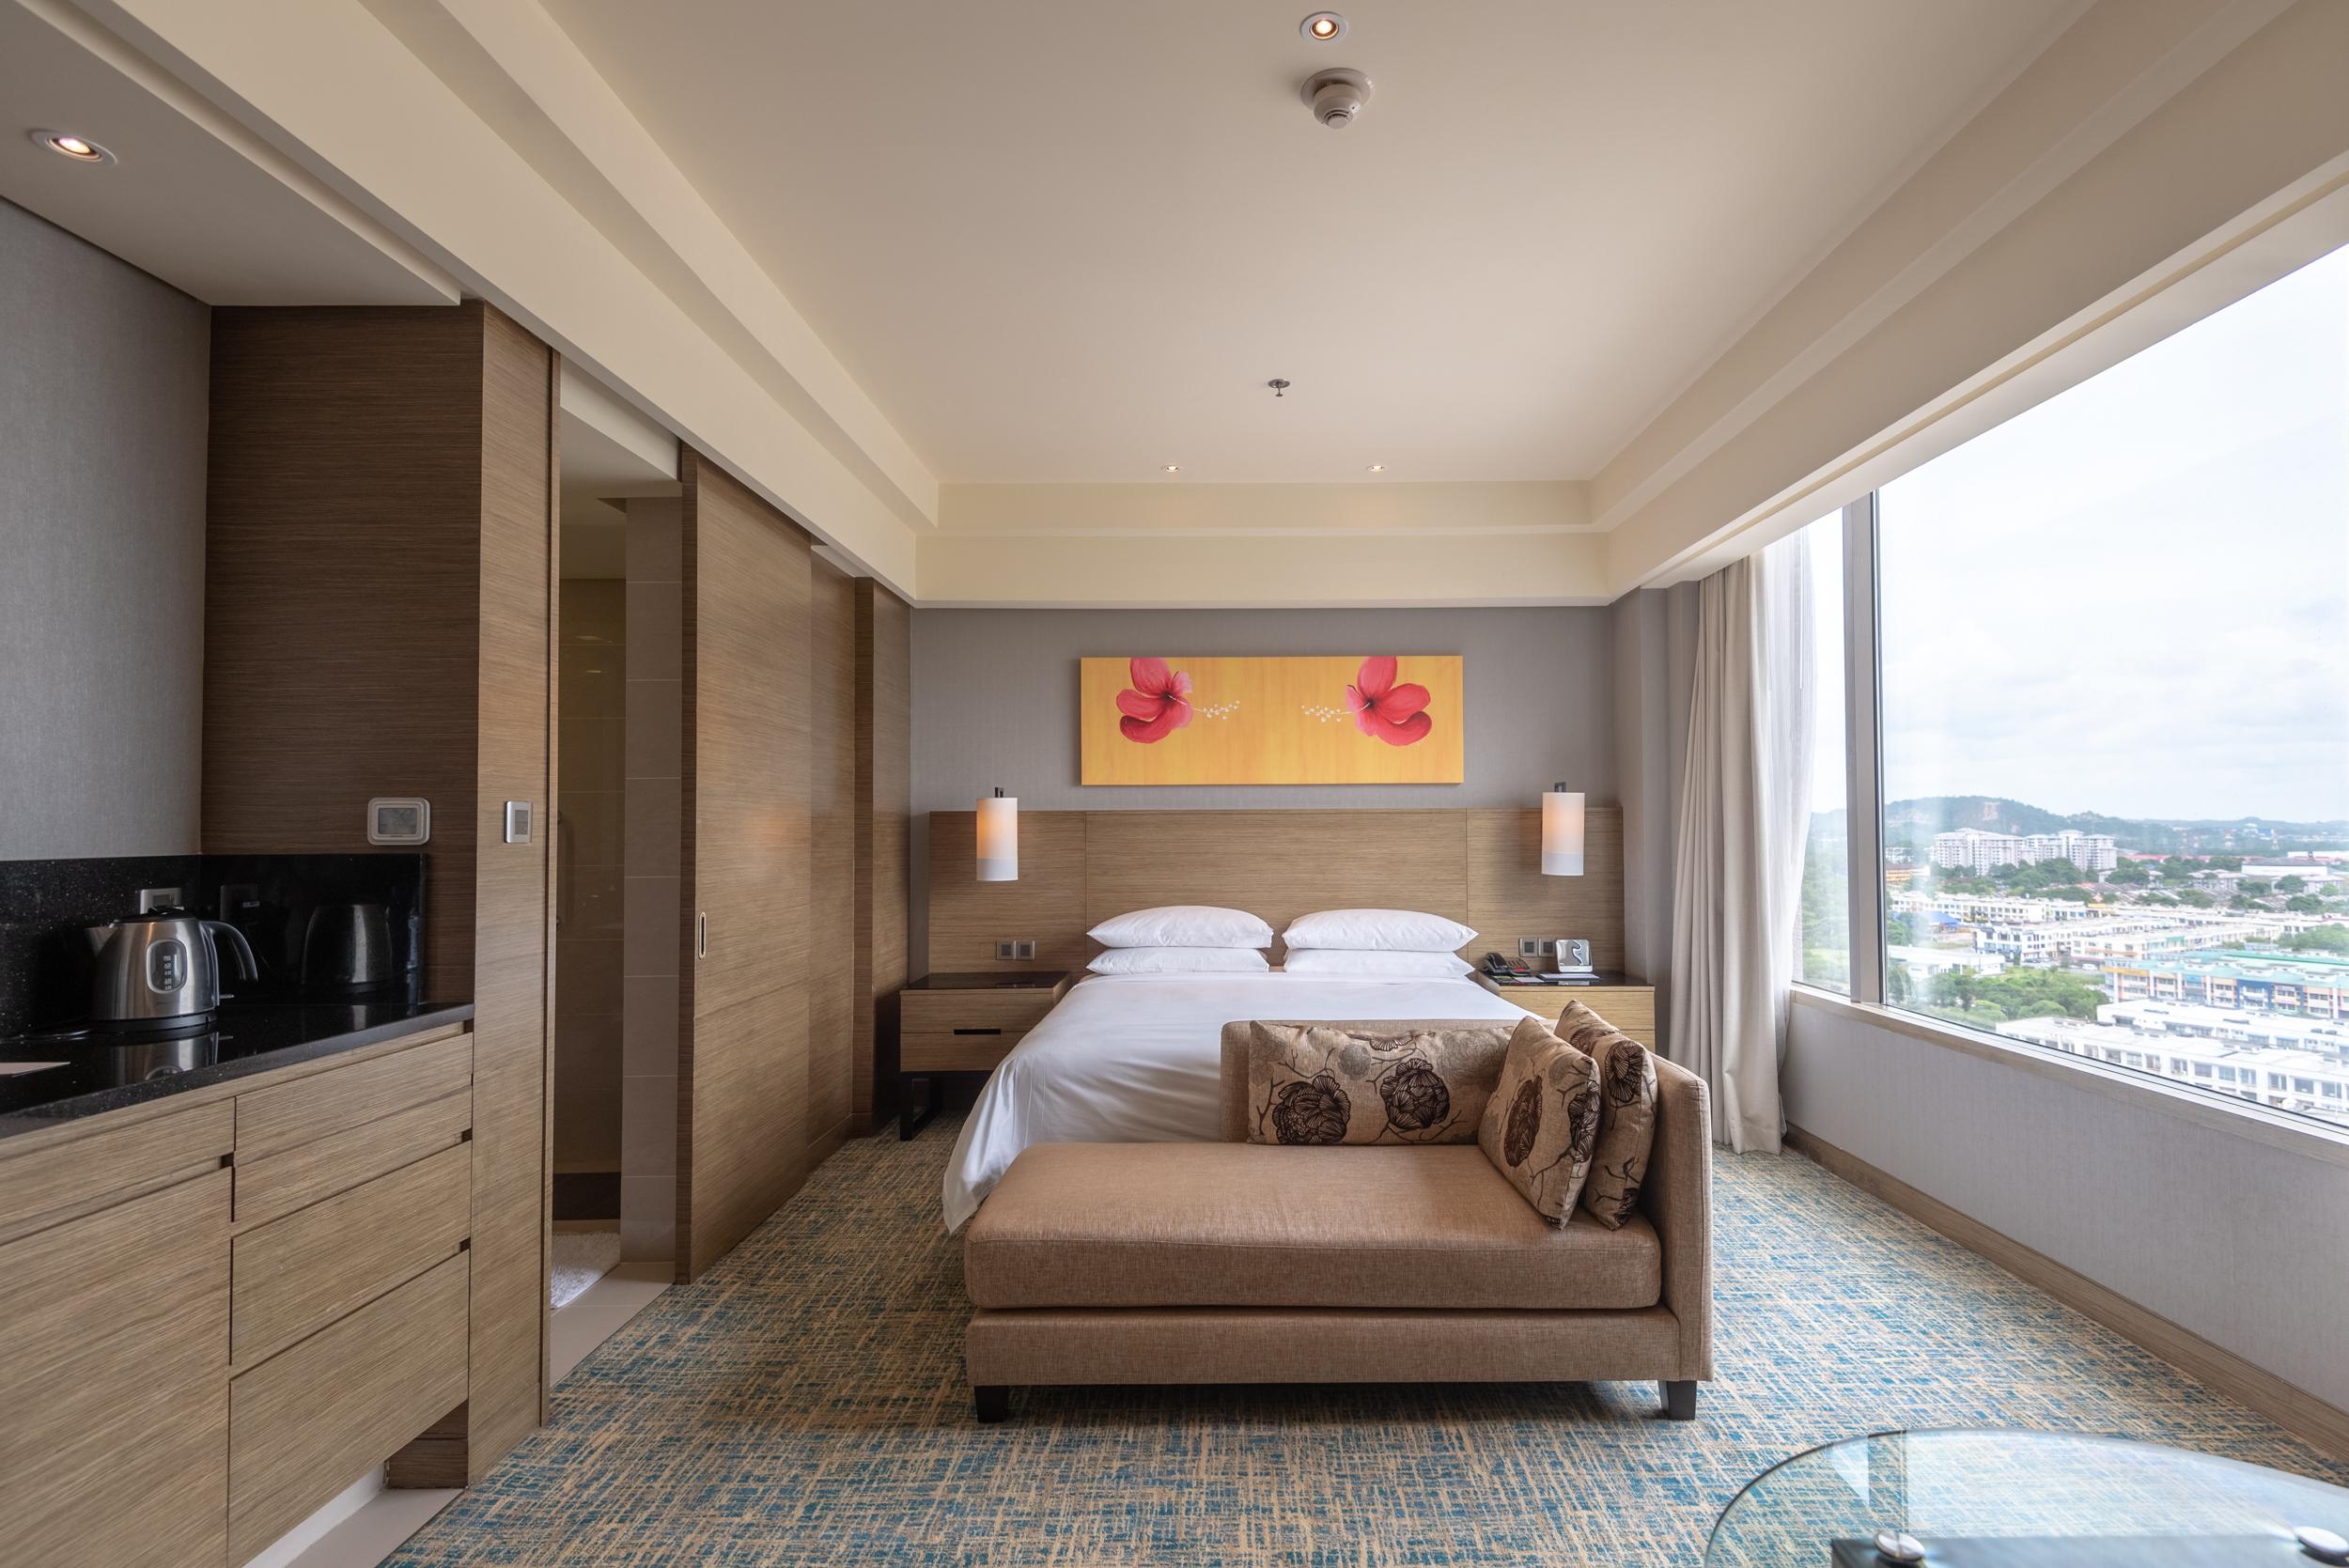 Comfortable Bed  Club Room - Renaissance Johor Bahru Hotel